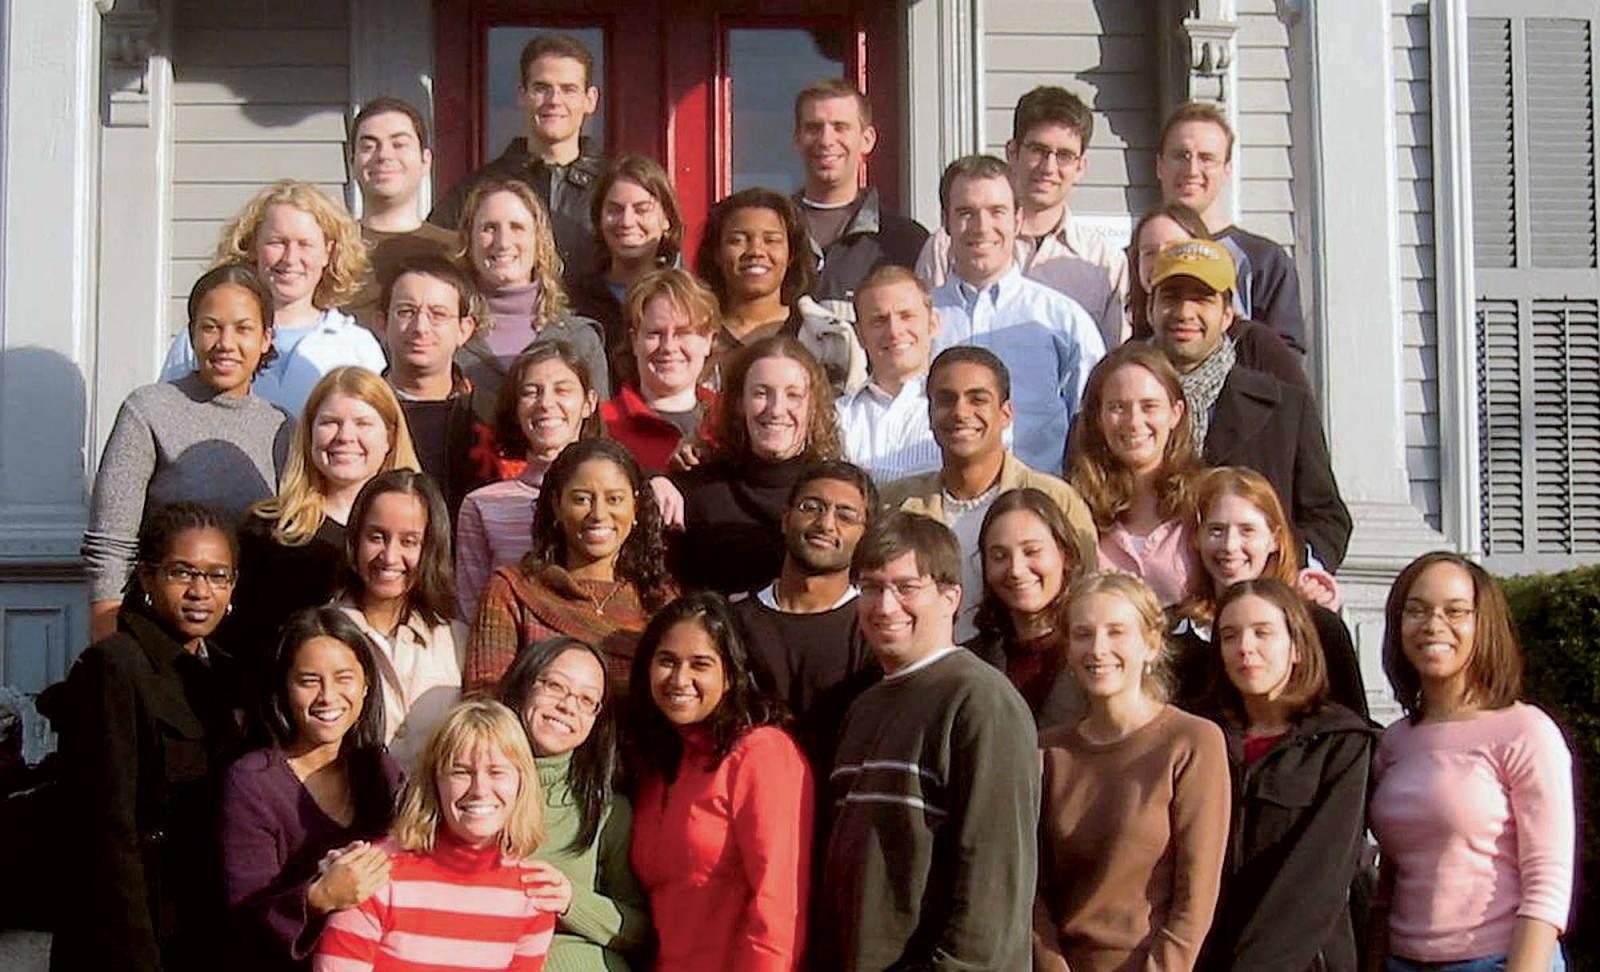 Group photo of Harvard Legal Aid Bureau on the steps of their 1587 Massachusetts Ave. office